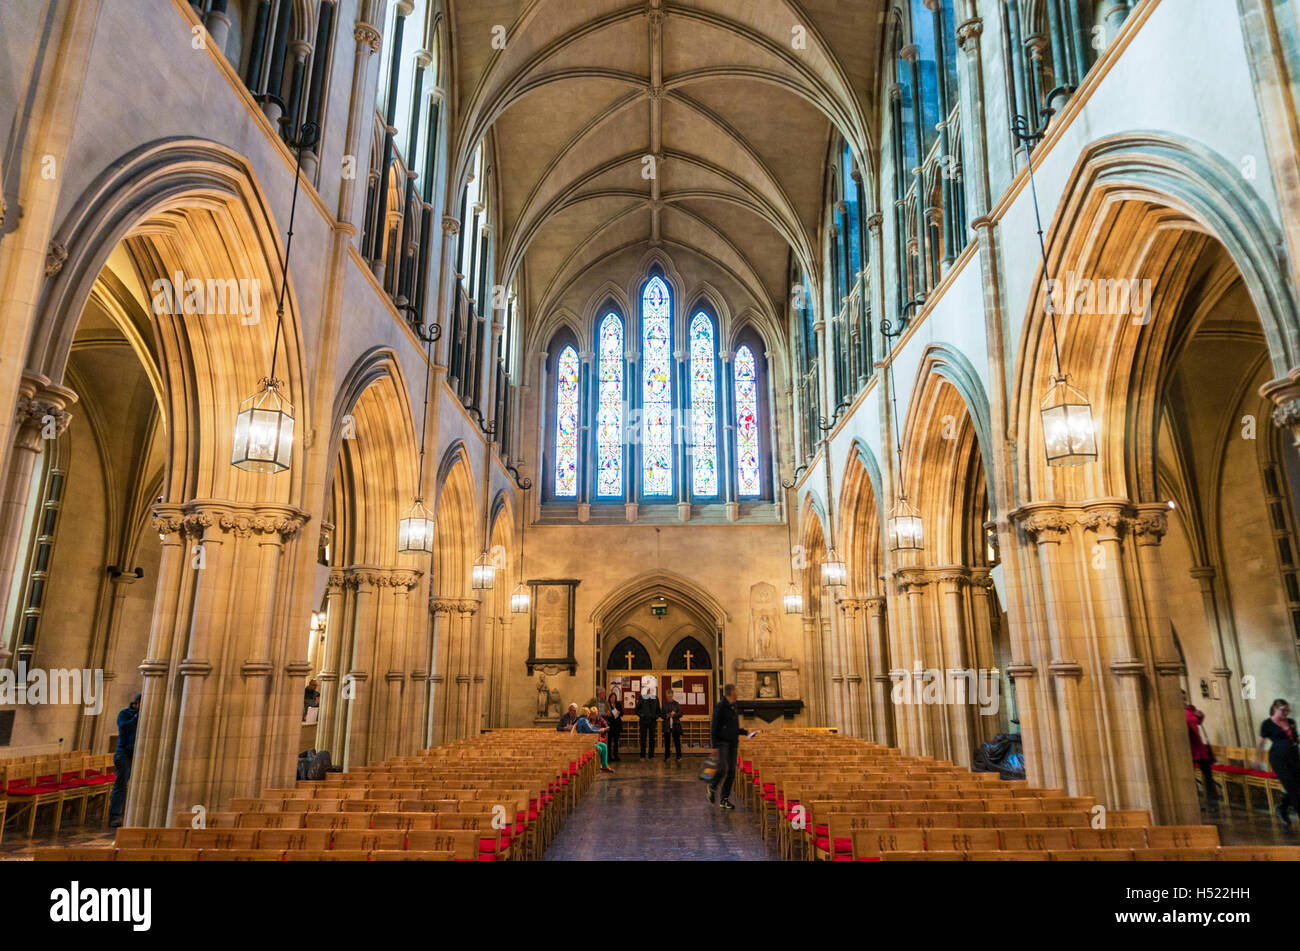 Interior of Christ church cathedral Dublin Ireland Europe EU - Stock Image